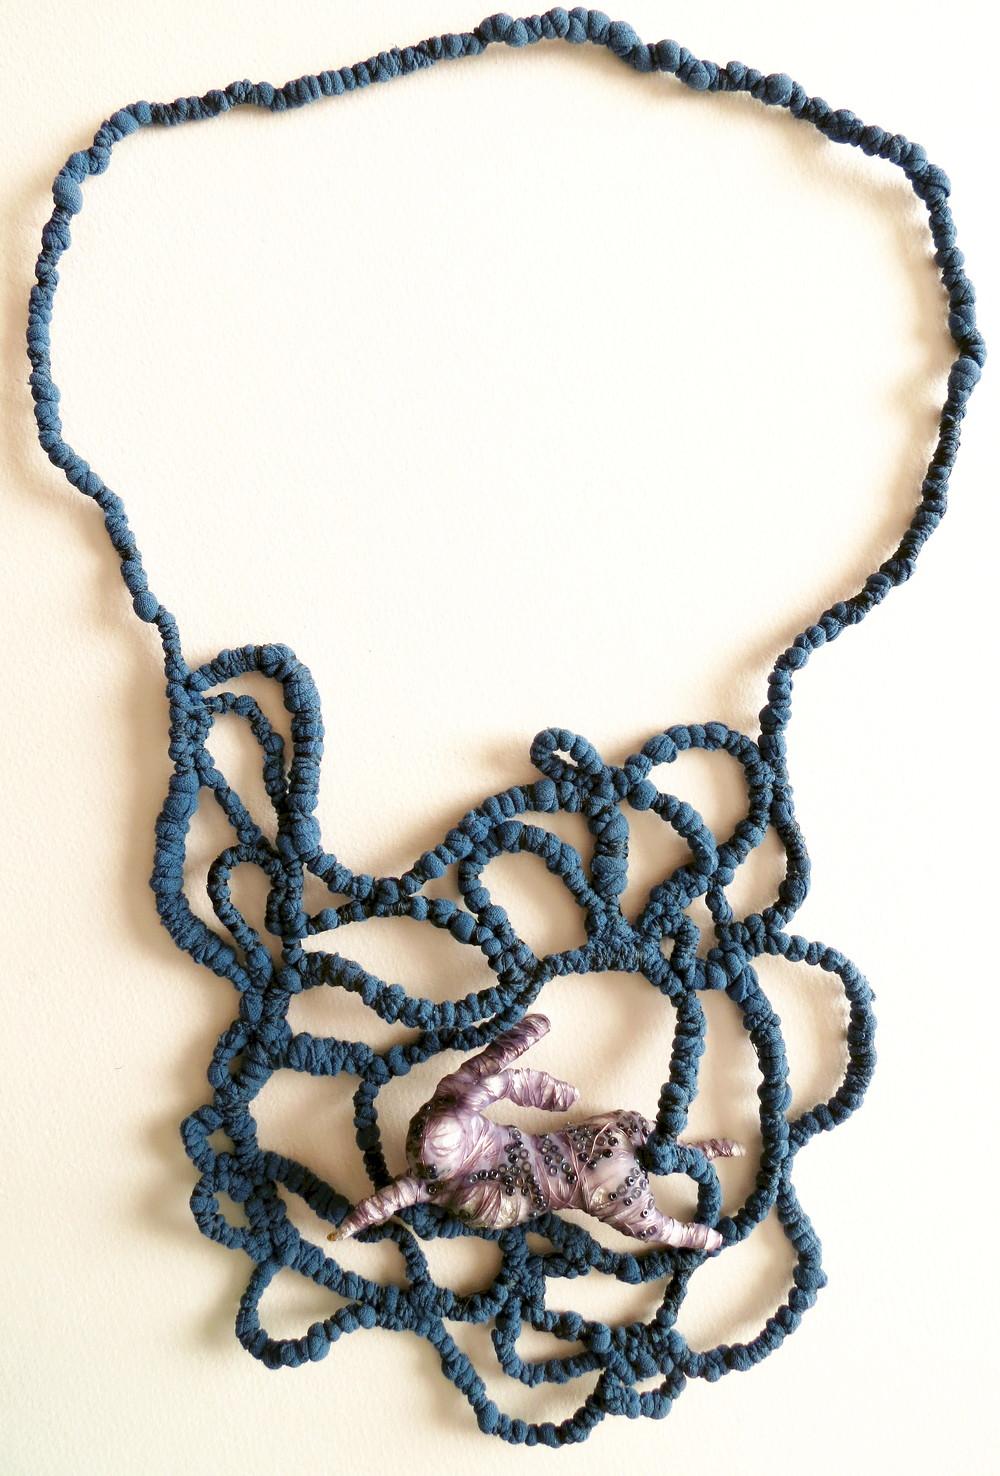 Down the Rabbit Hole - Francesca Cecchini (2013), necklace // Materials: repurposed nylon stockings, kitchen foil, copper wire, glass beads, translucent polymer clay, silk thread.